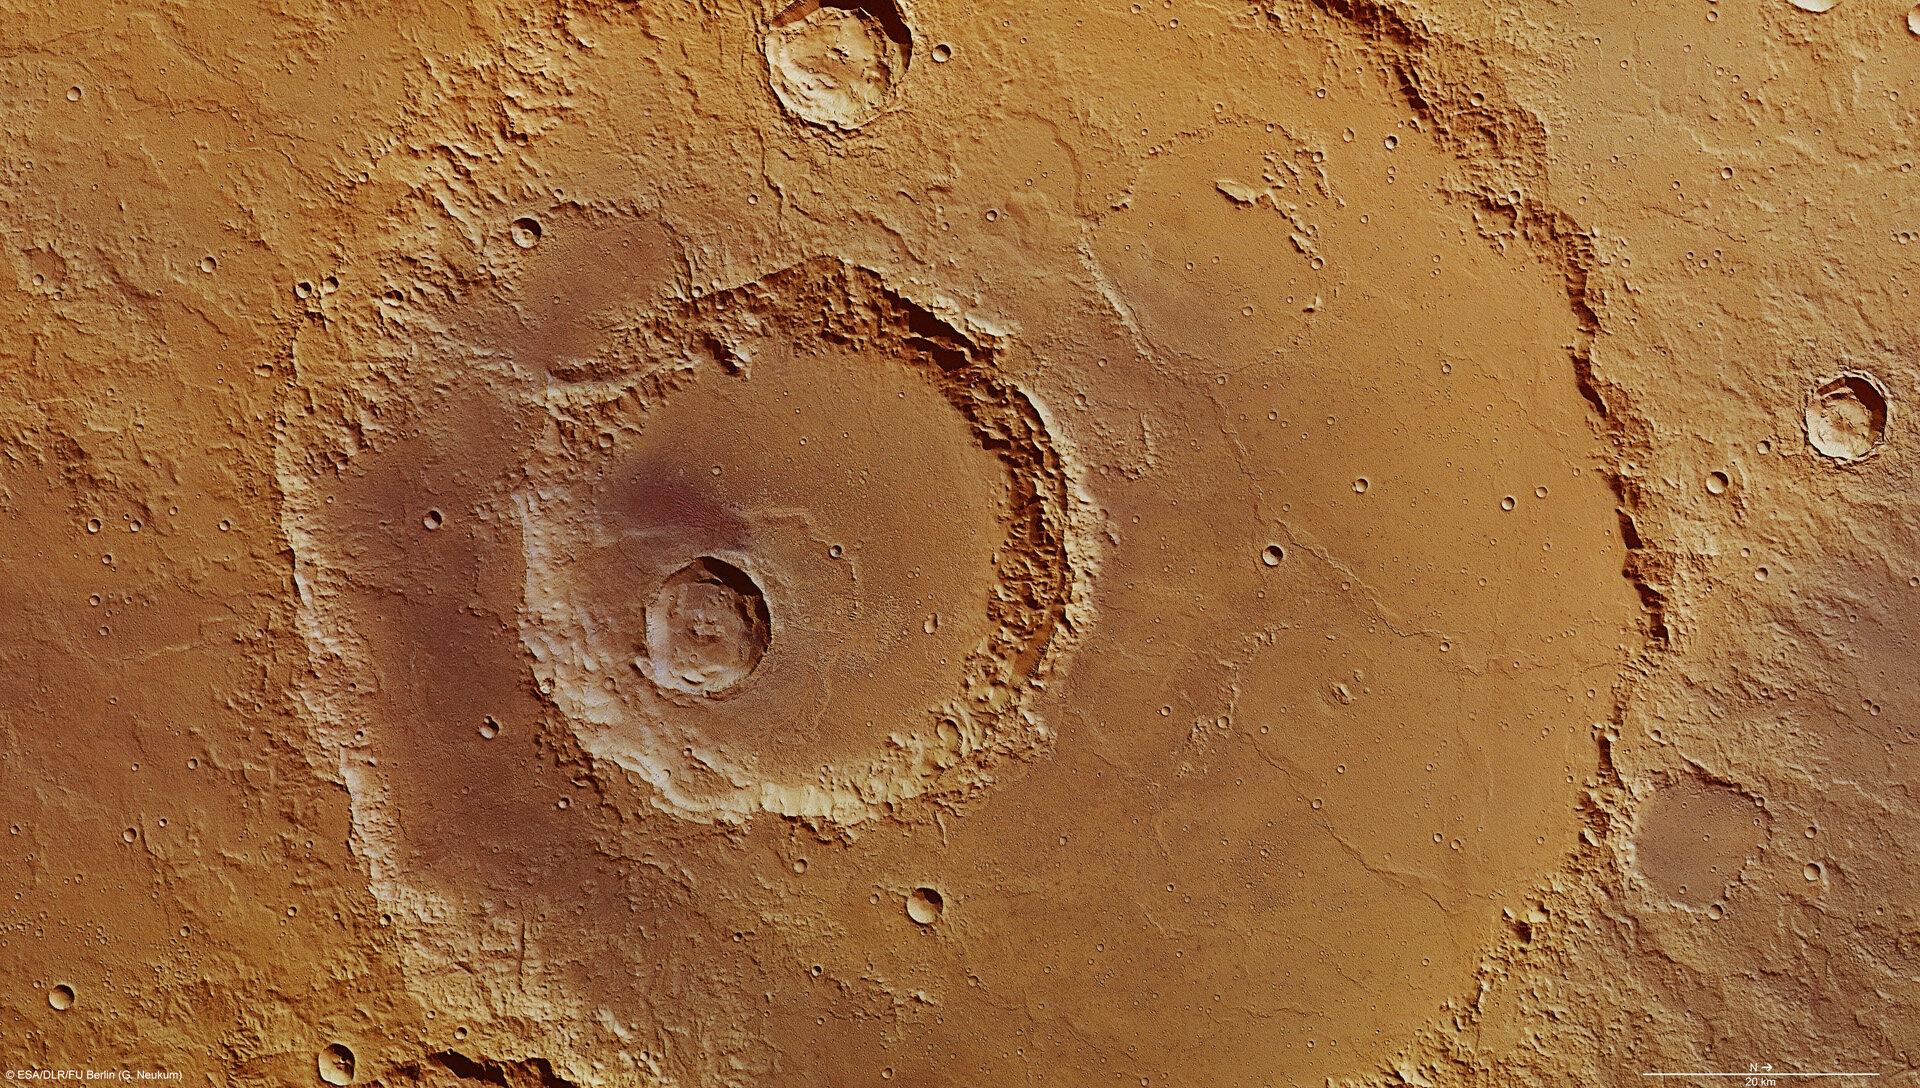 Hadley_Crater_pillars.jpg